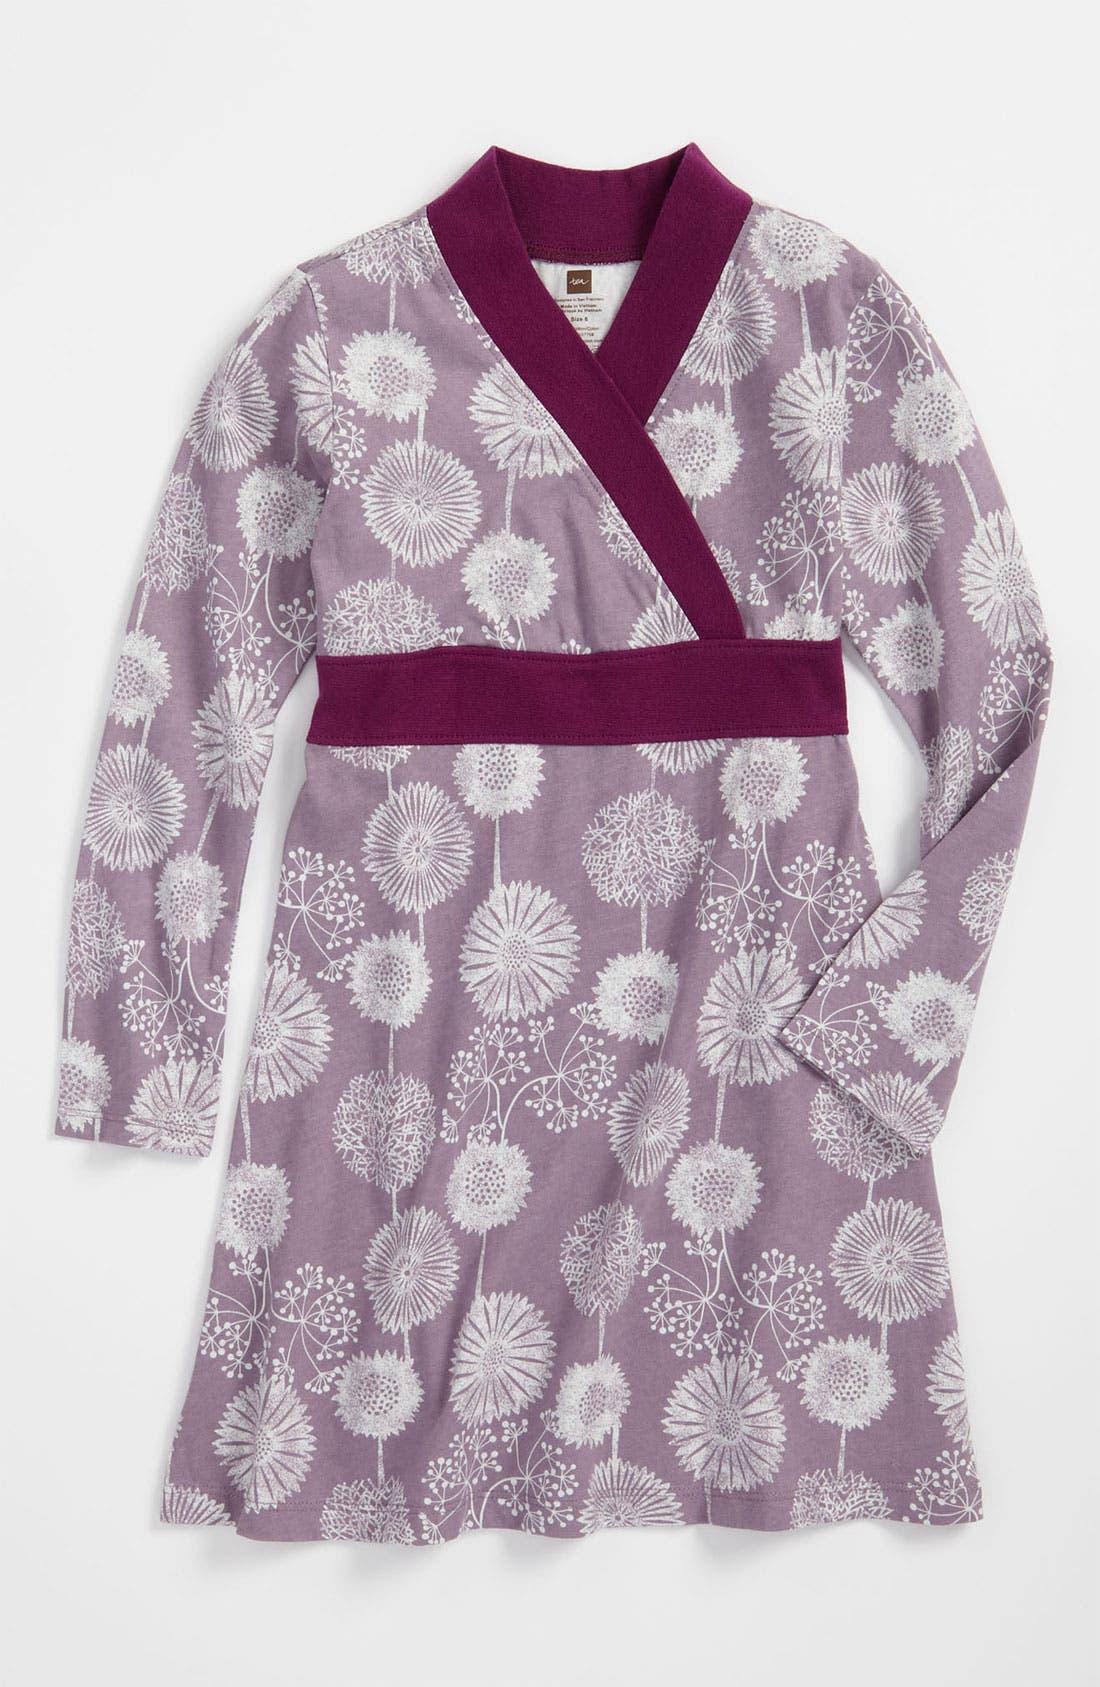 Main Image - Tea Collection Floral Wrap Dress (Toddler)